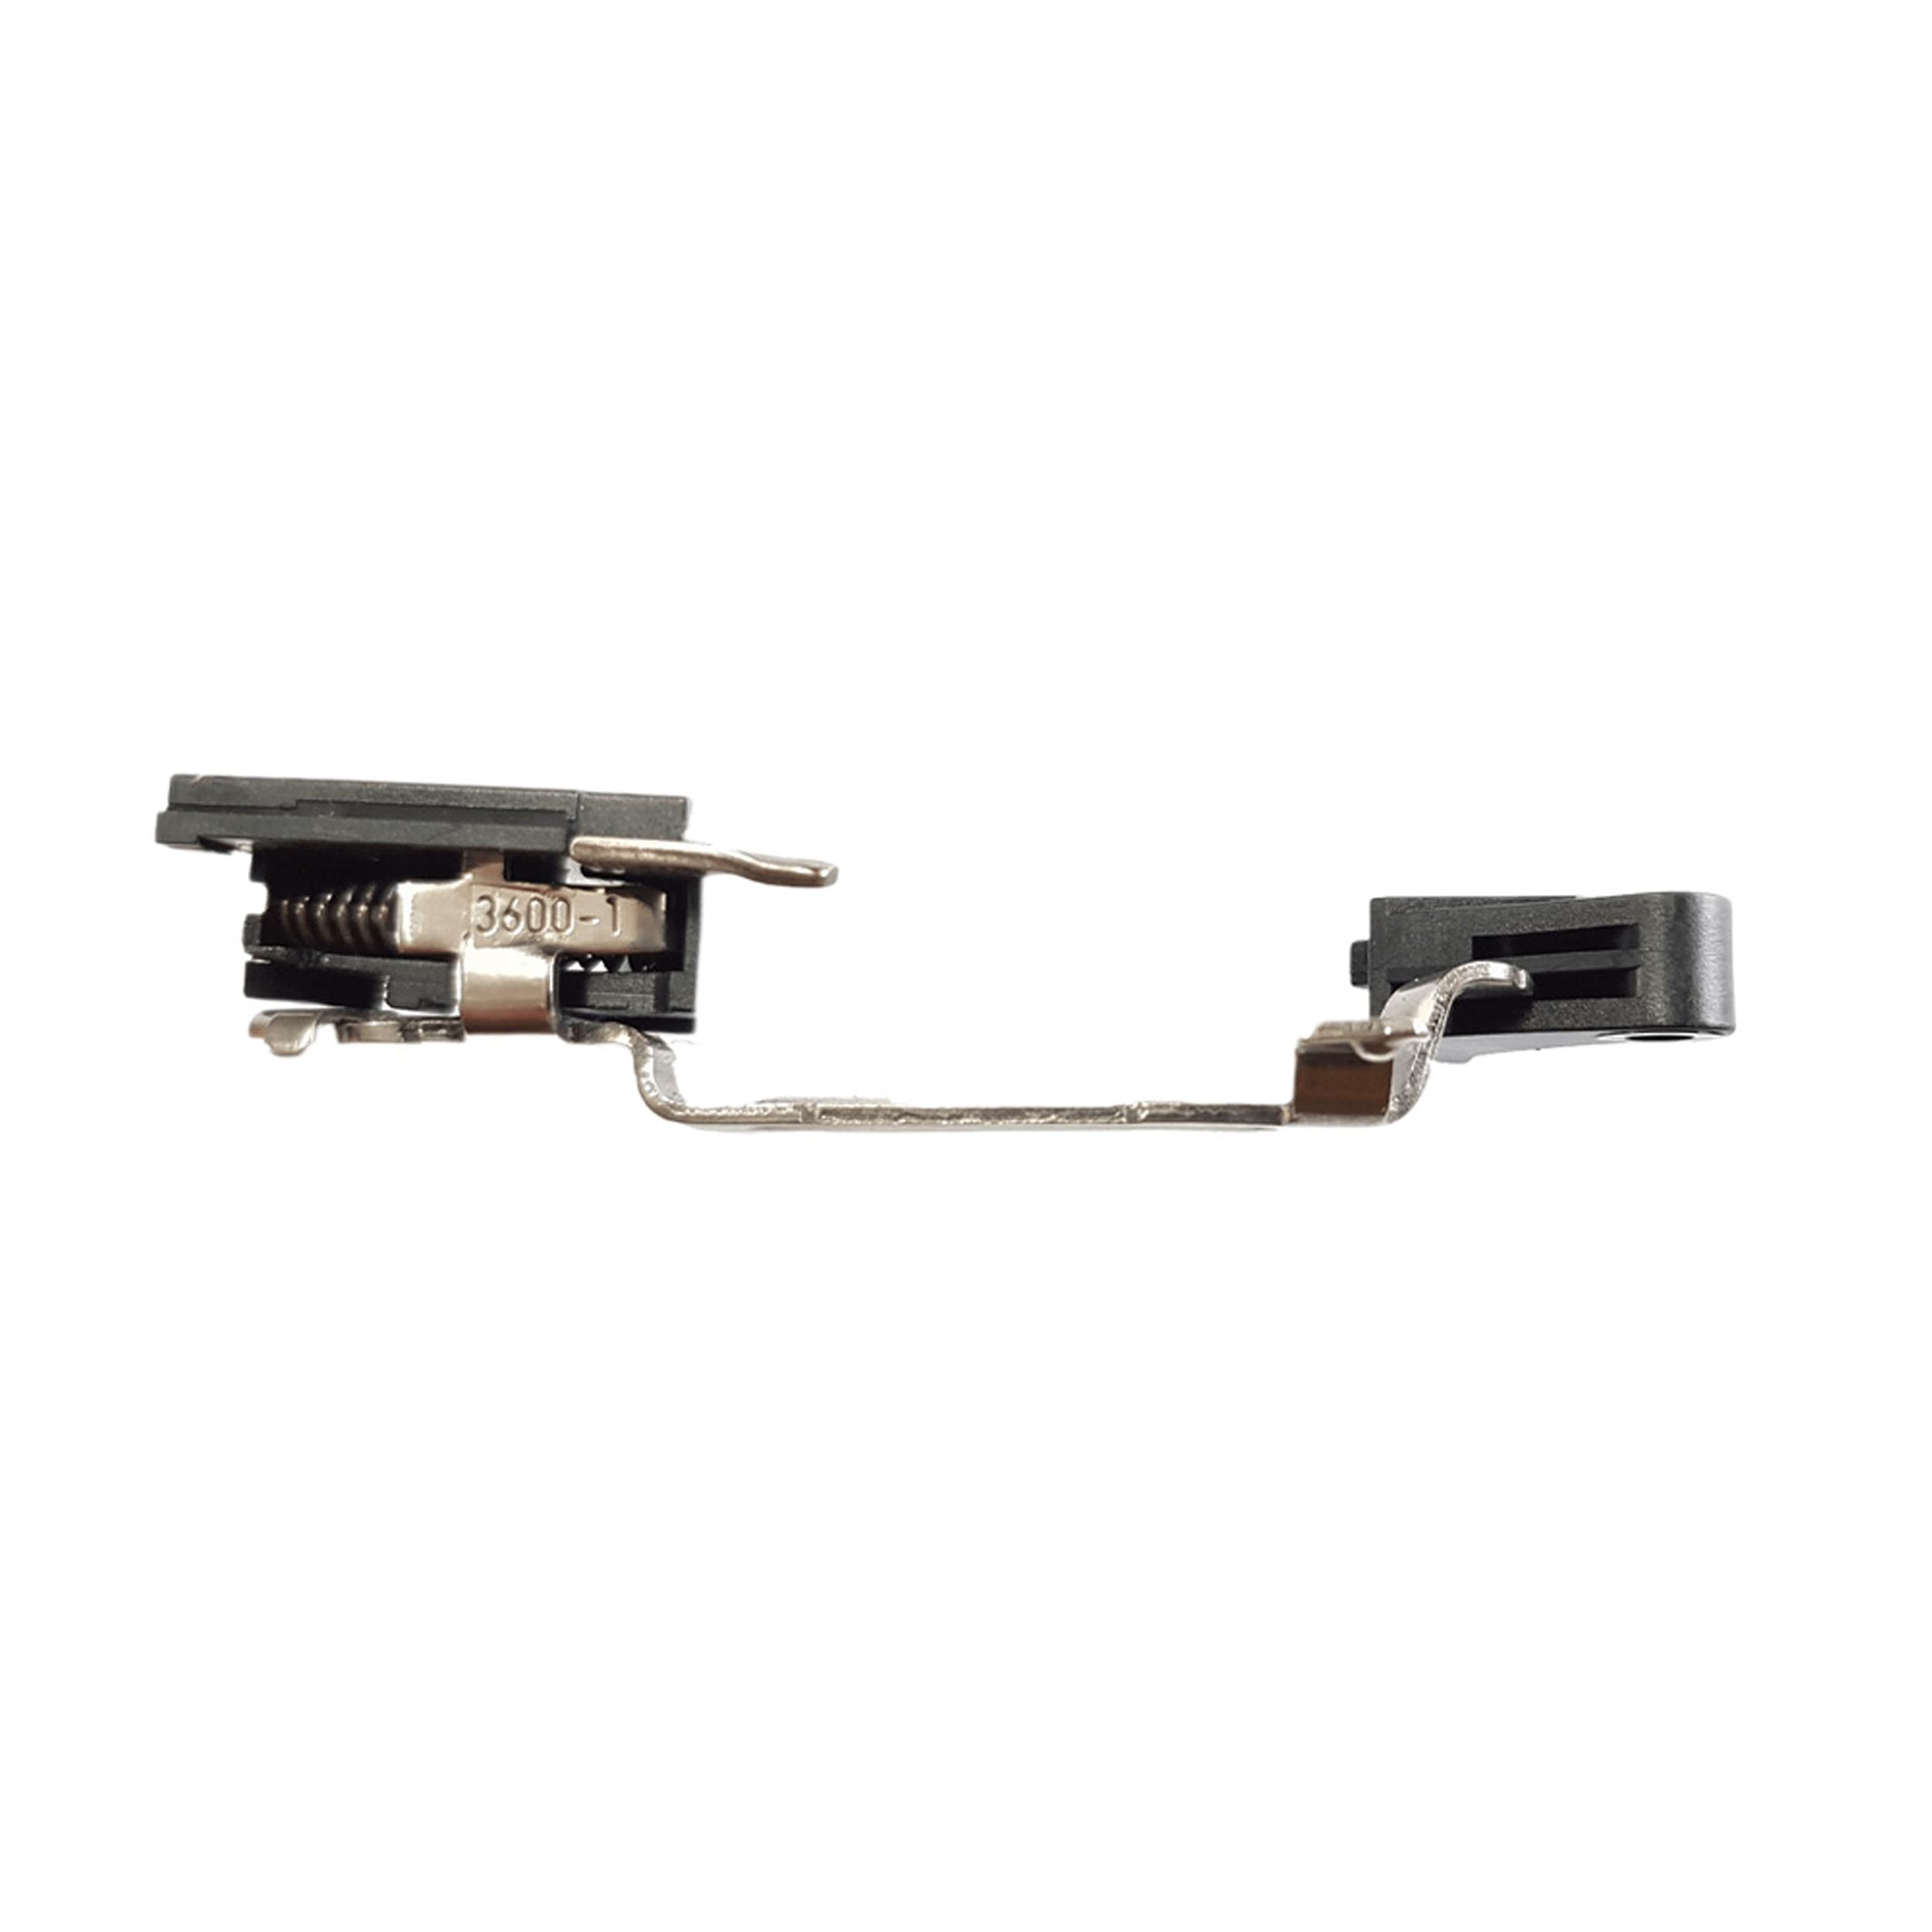 LA-GRT-C Reset Trigger Glock 9mm / .40 S & W / .357 SIG - Gen 4